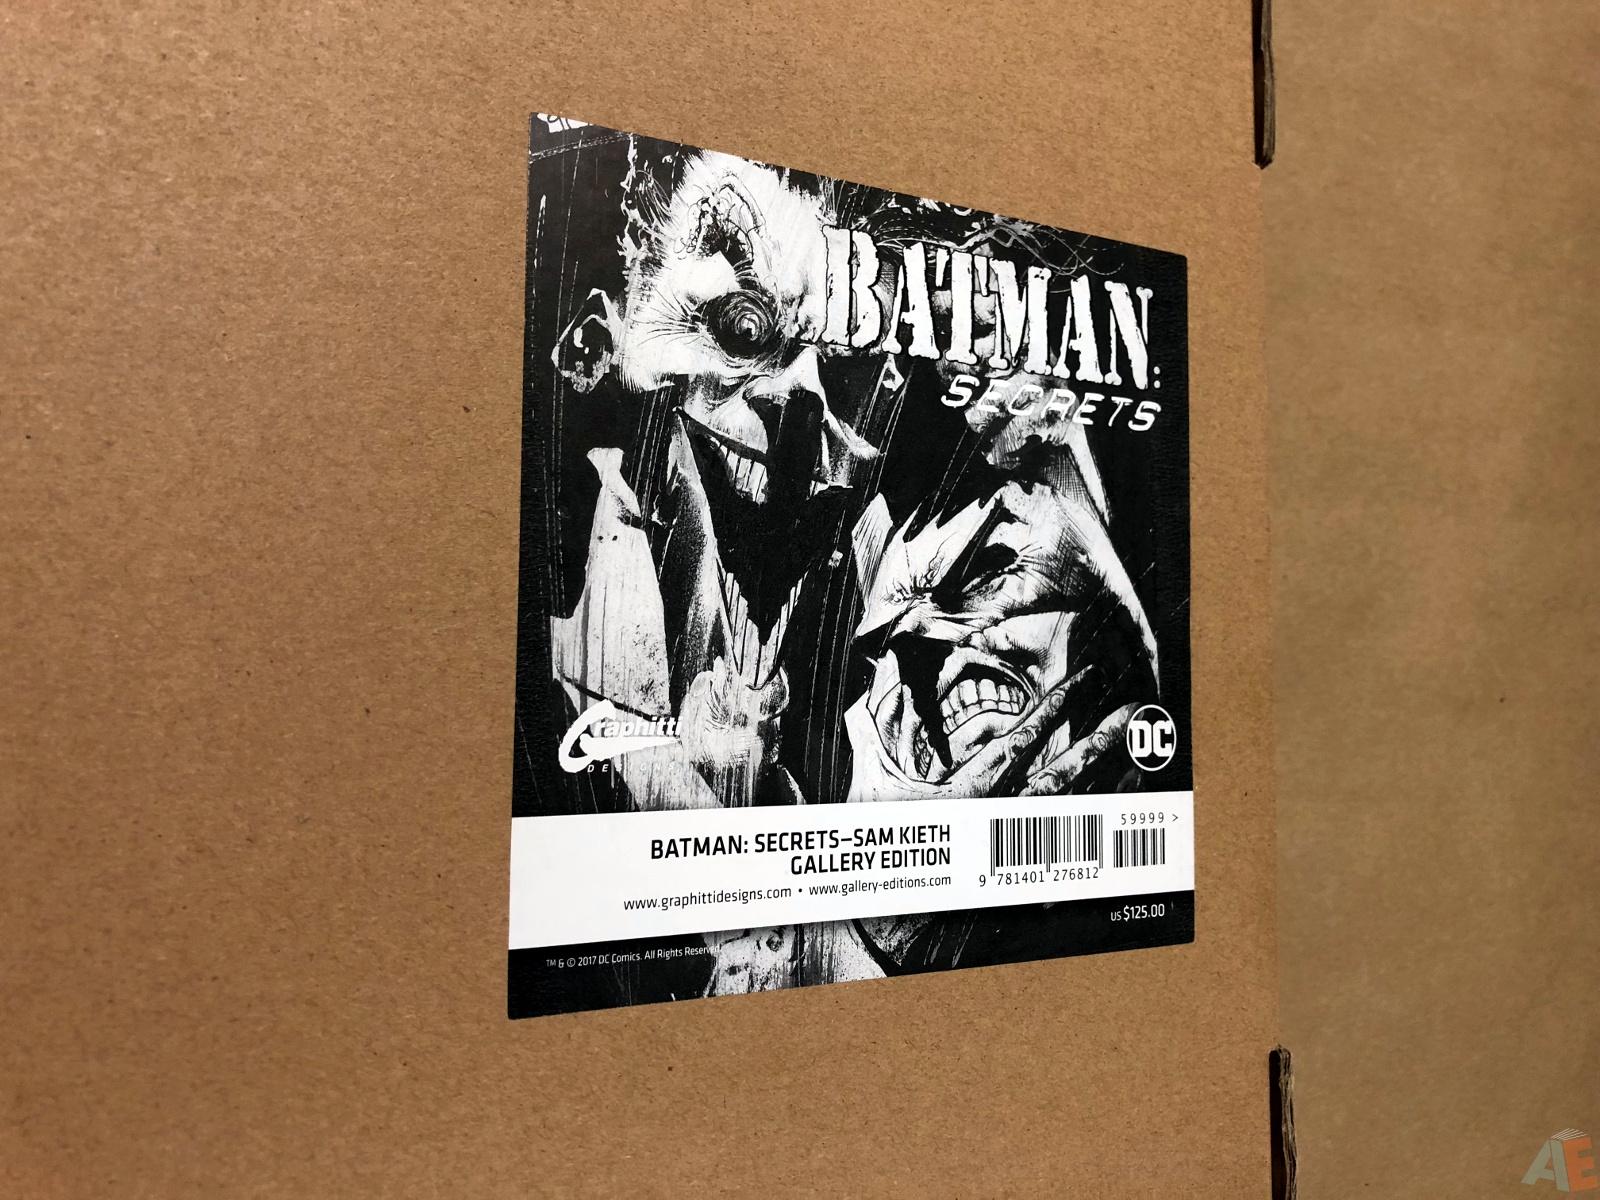 Batman: Secrets – Sam Kieth Gallery Edition 59